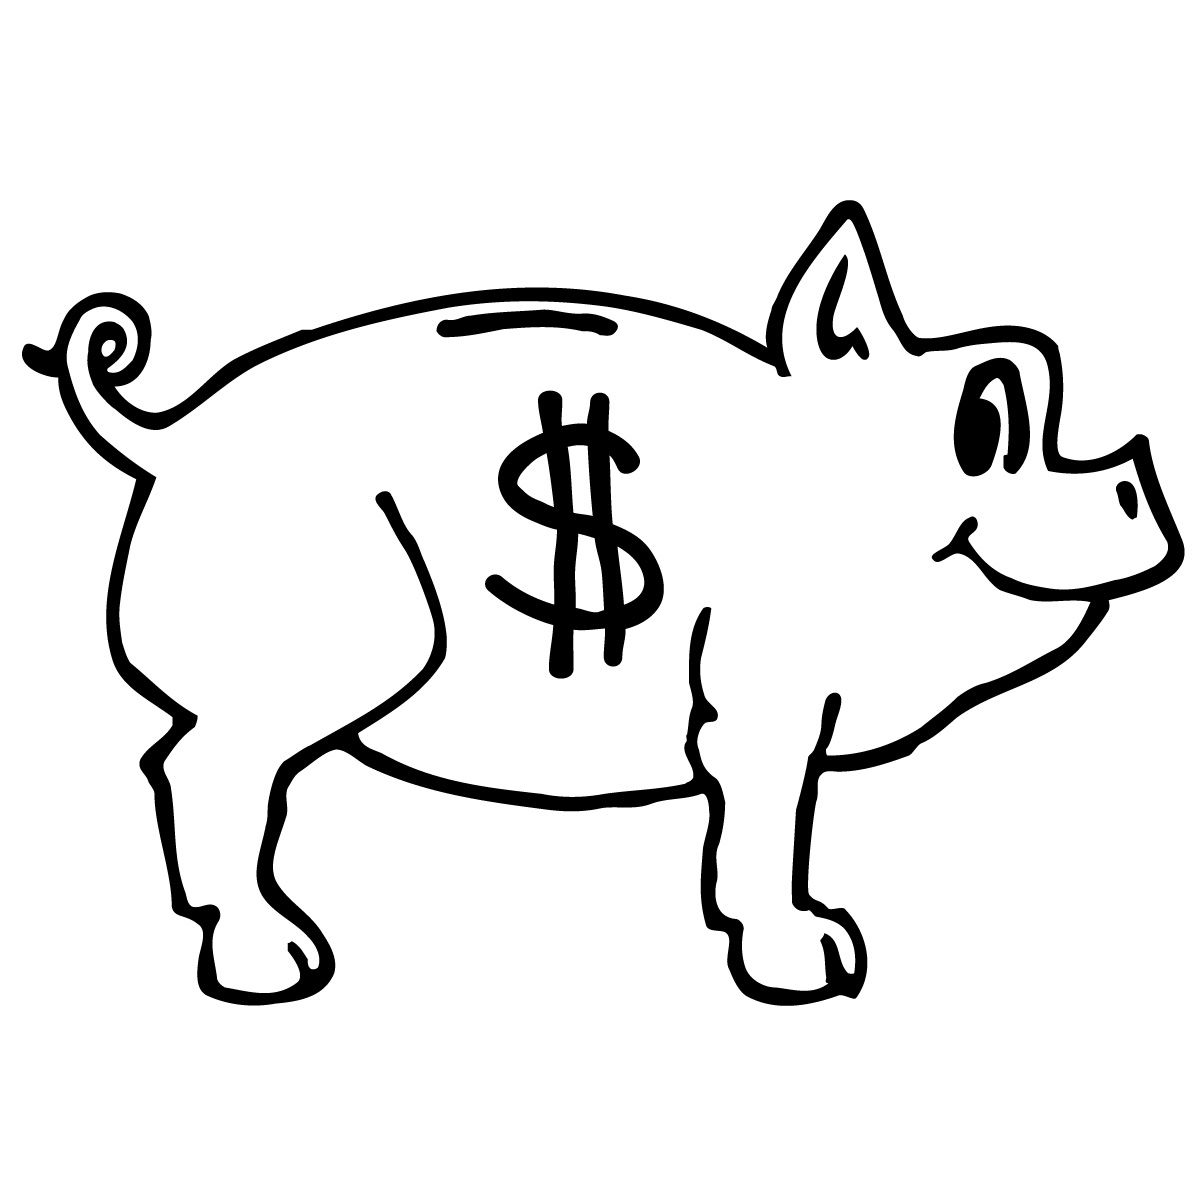 Piggybankbnw Jpg 1200 1200 Coloring Pages American Dollar Piggy